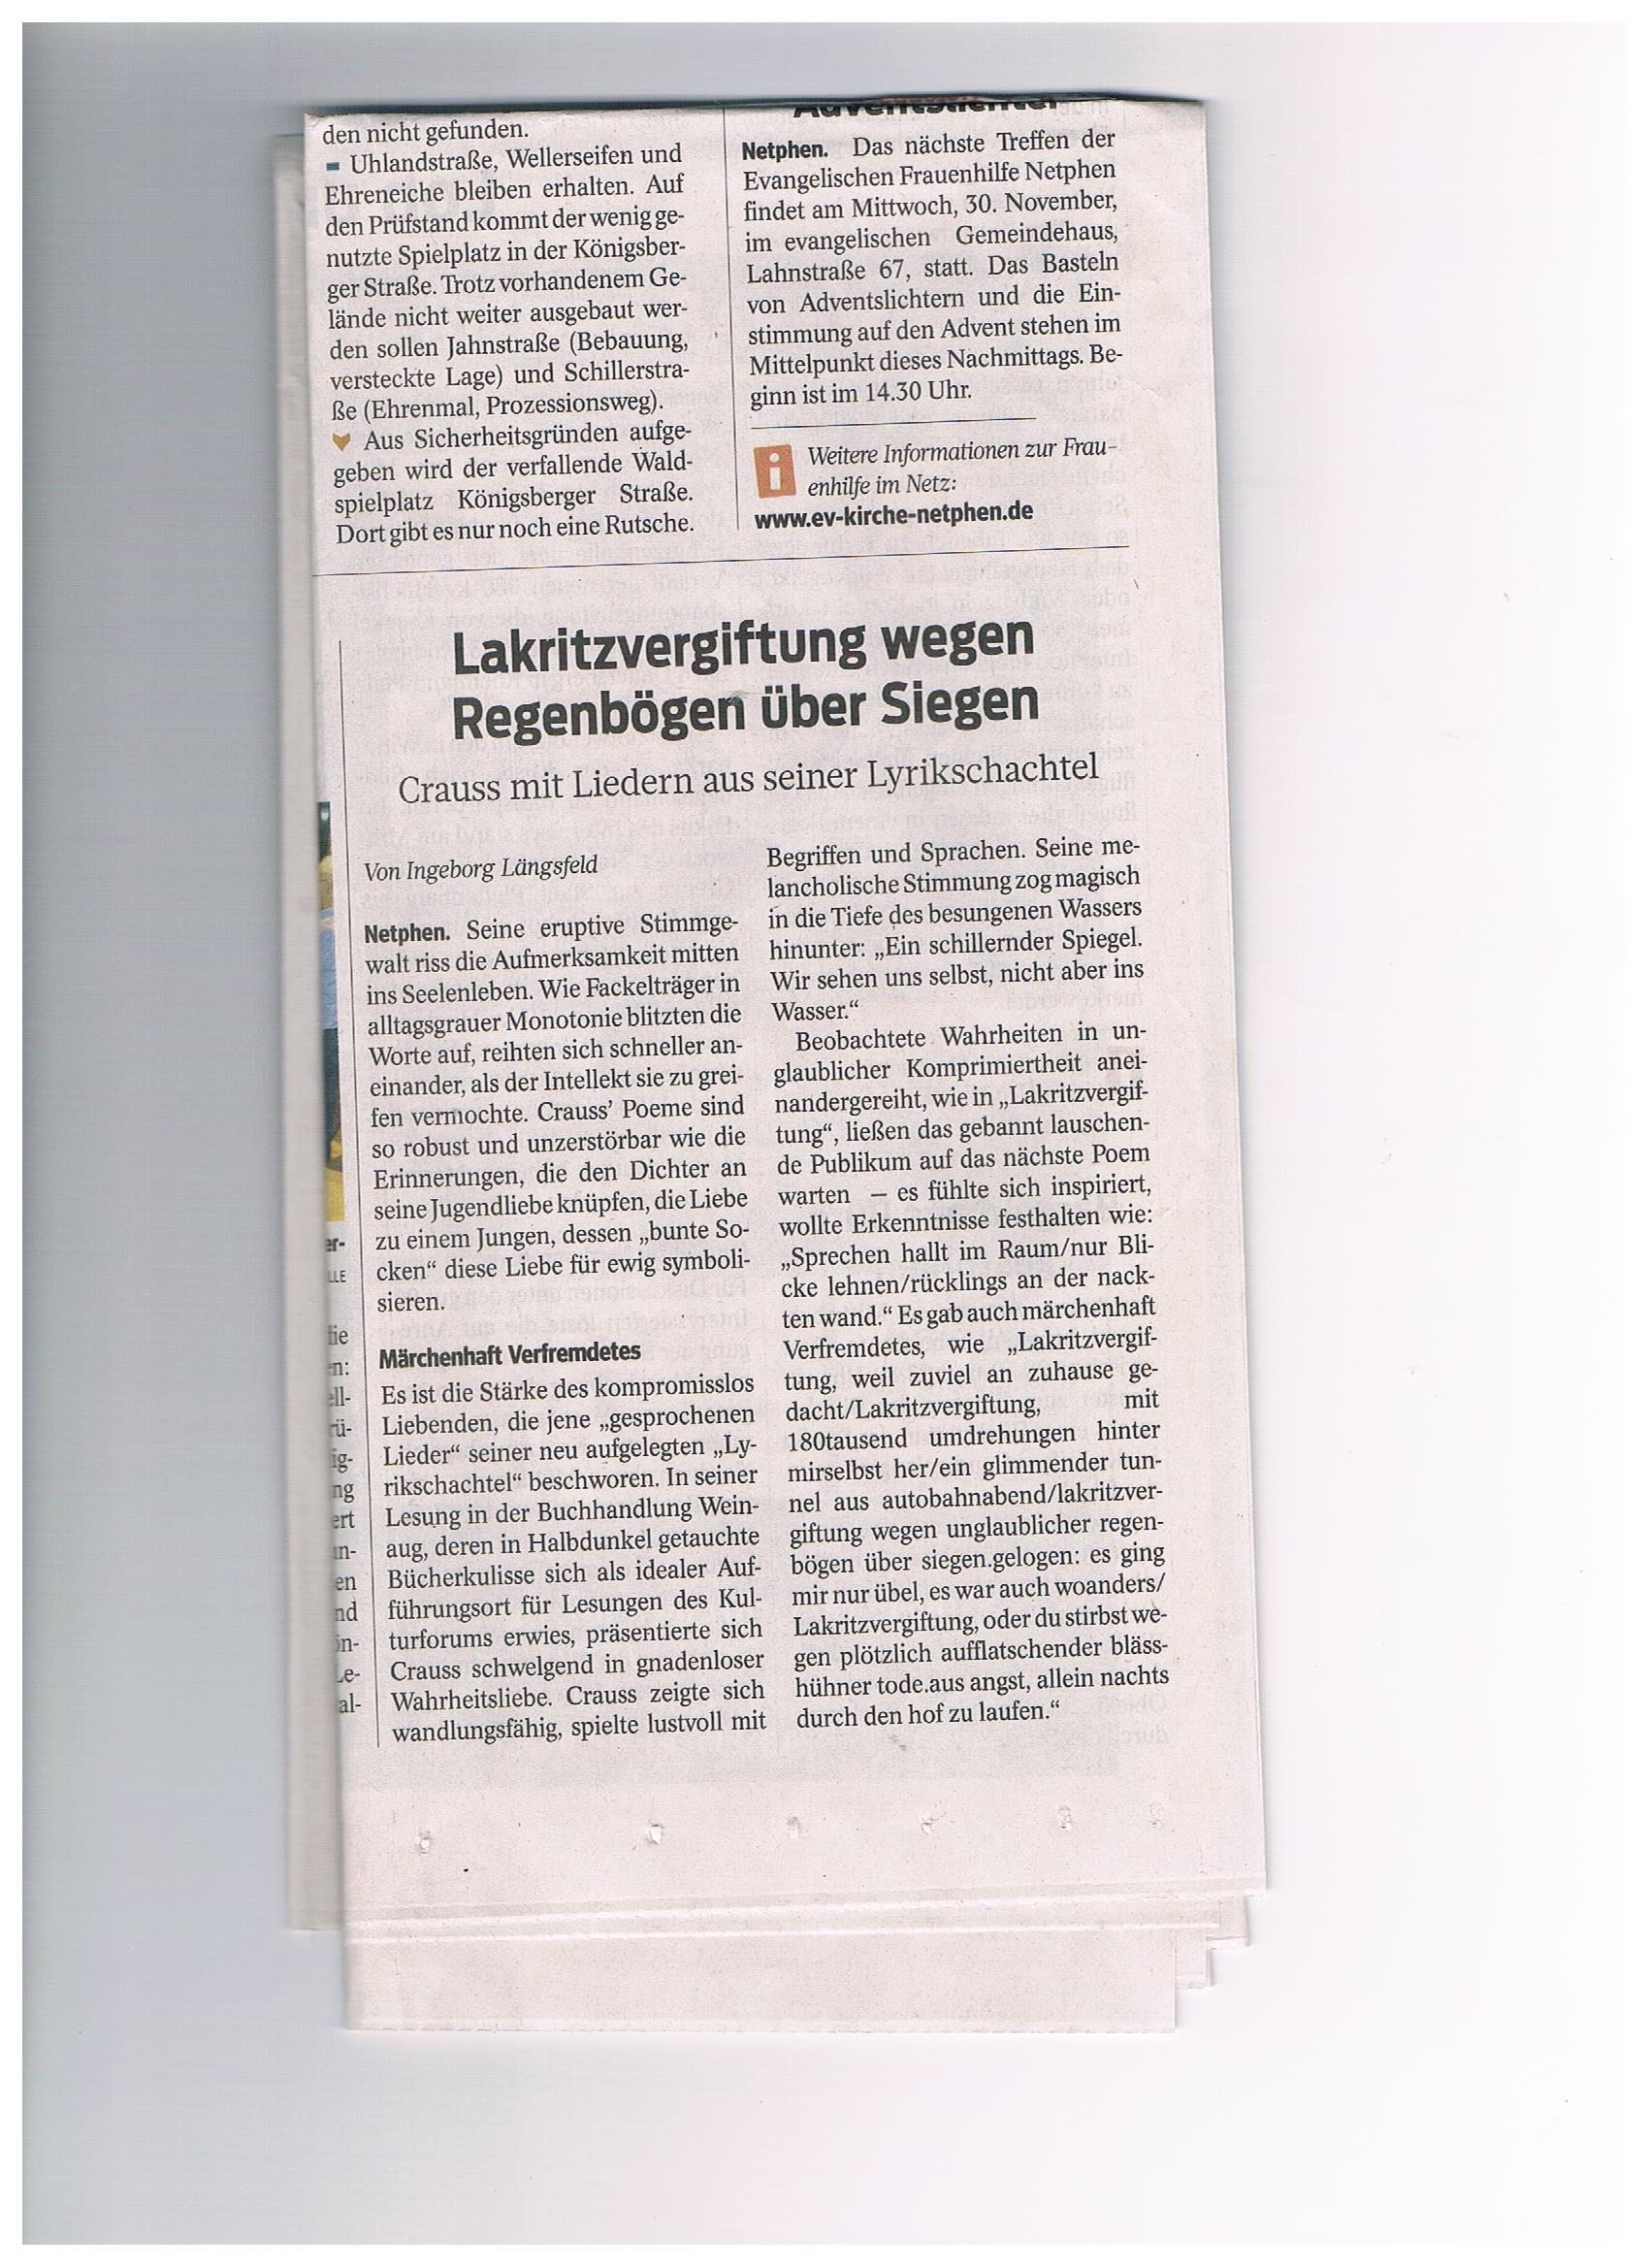 Westfälische Rundschau, 25.11.2016